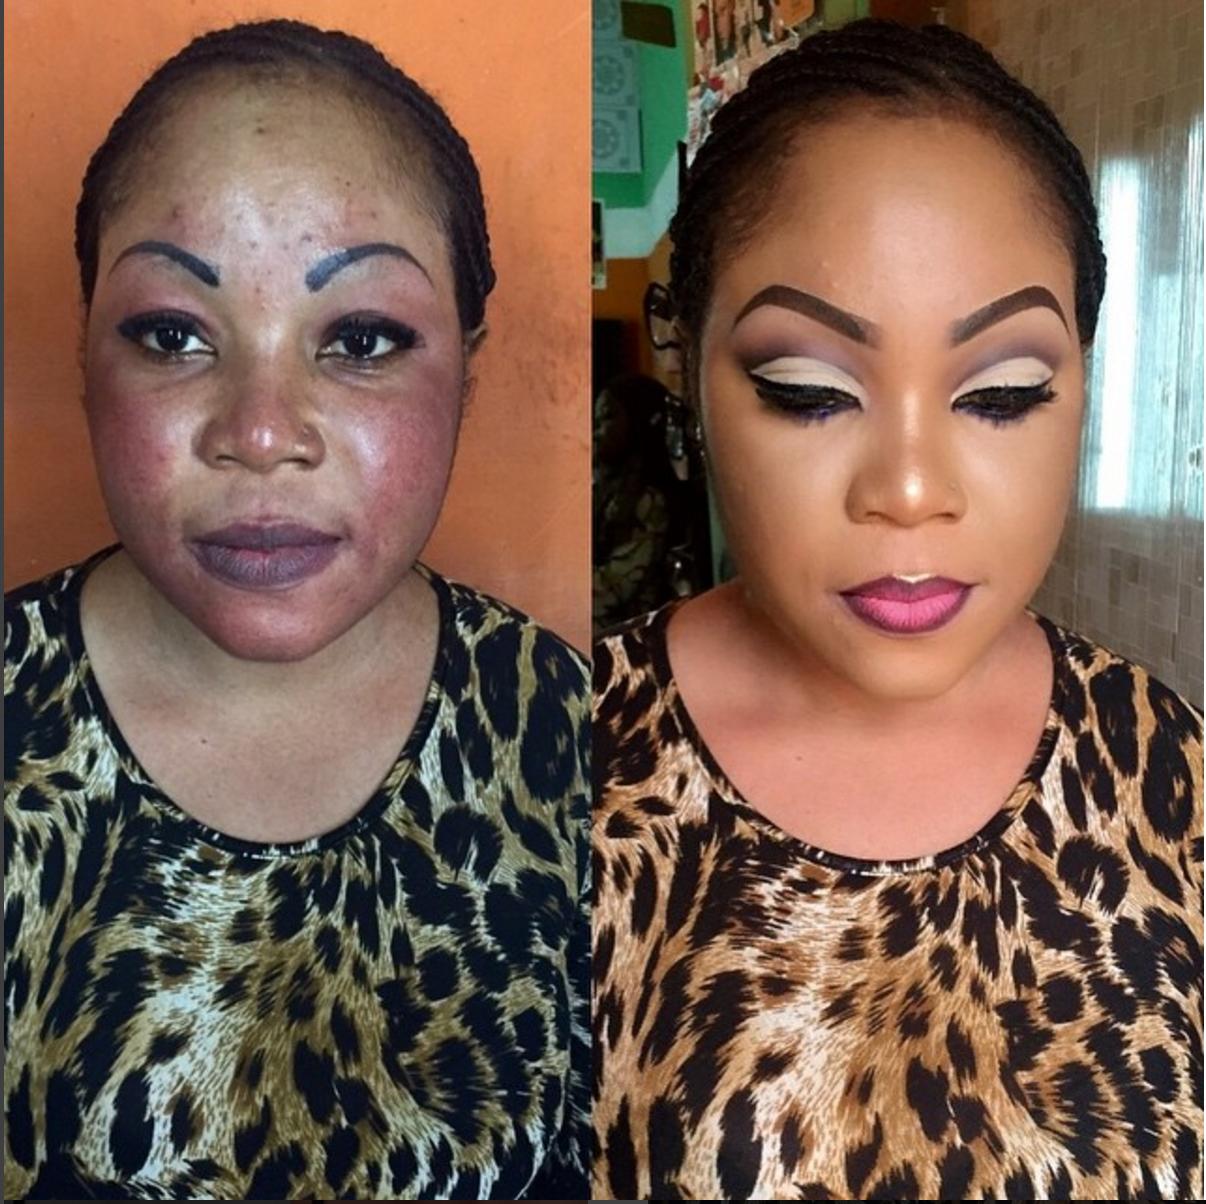 10 Most Shocking Makeup Transformations